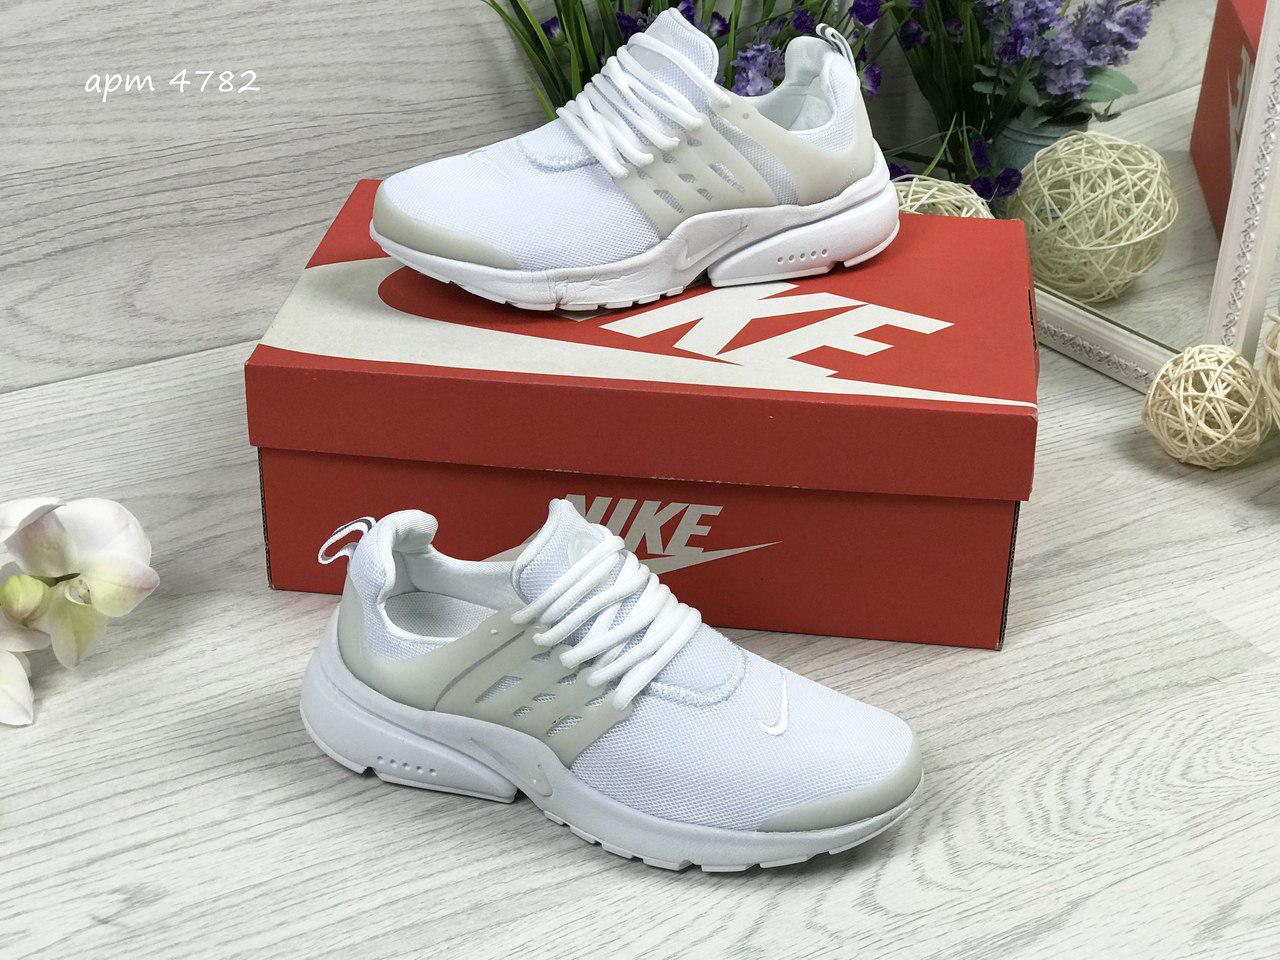 Женские Кроссовки Nike Air Presto   Найк Аир Престо в Стиле Р. 36-41 ... d5ad40a7e87